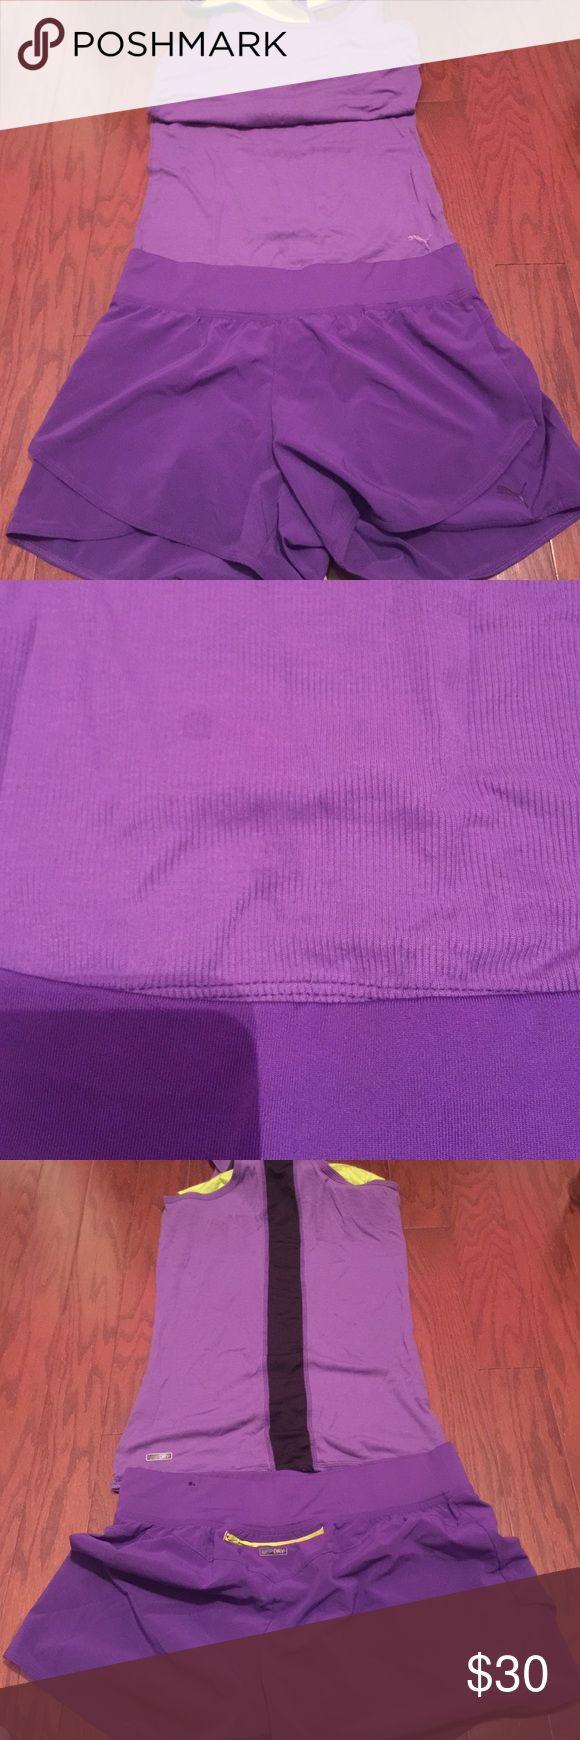 Puma Purple Trainer Puma Purple Trainer shorts size small top medium built in bra Puma Shorts